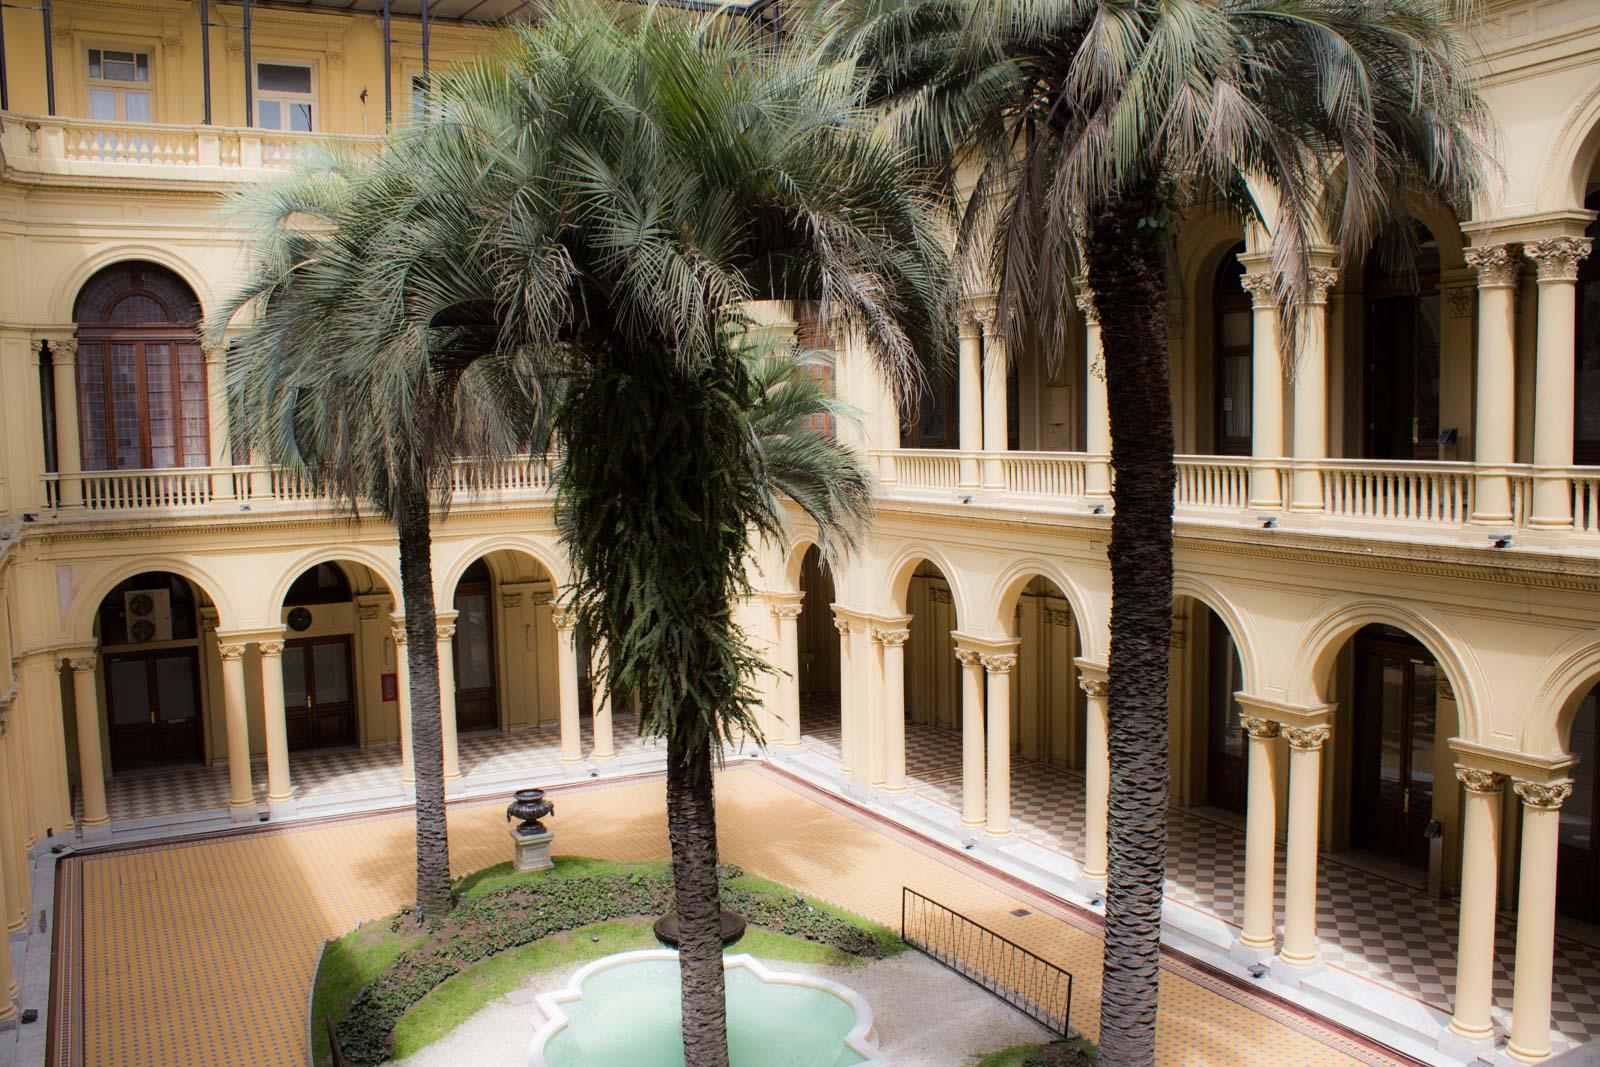 Casa Rosada, Presidential Palace, Buenos Aires, Argentina